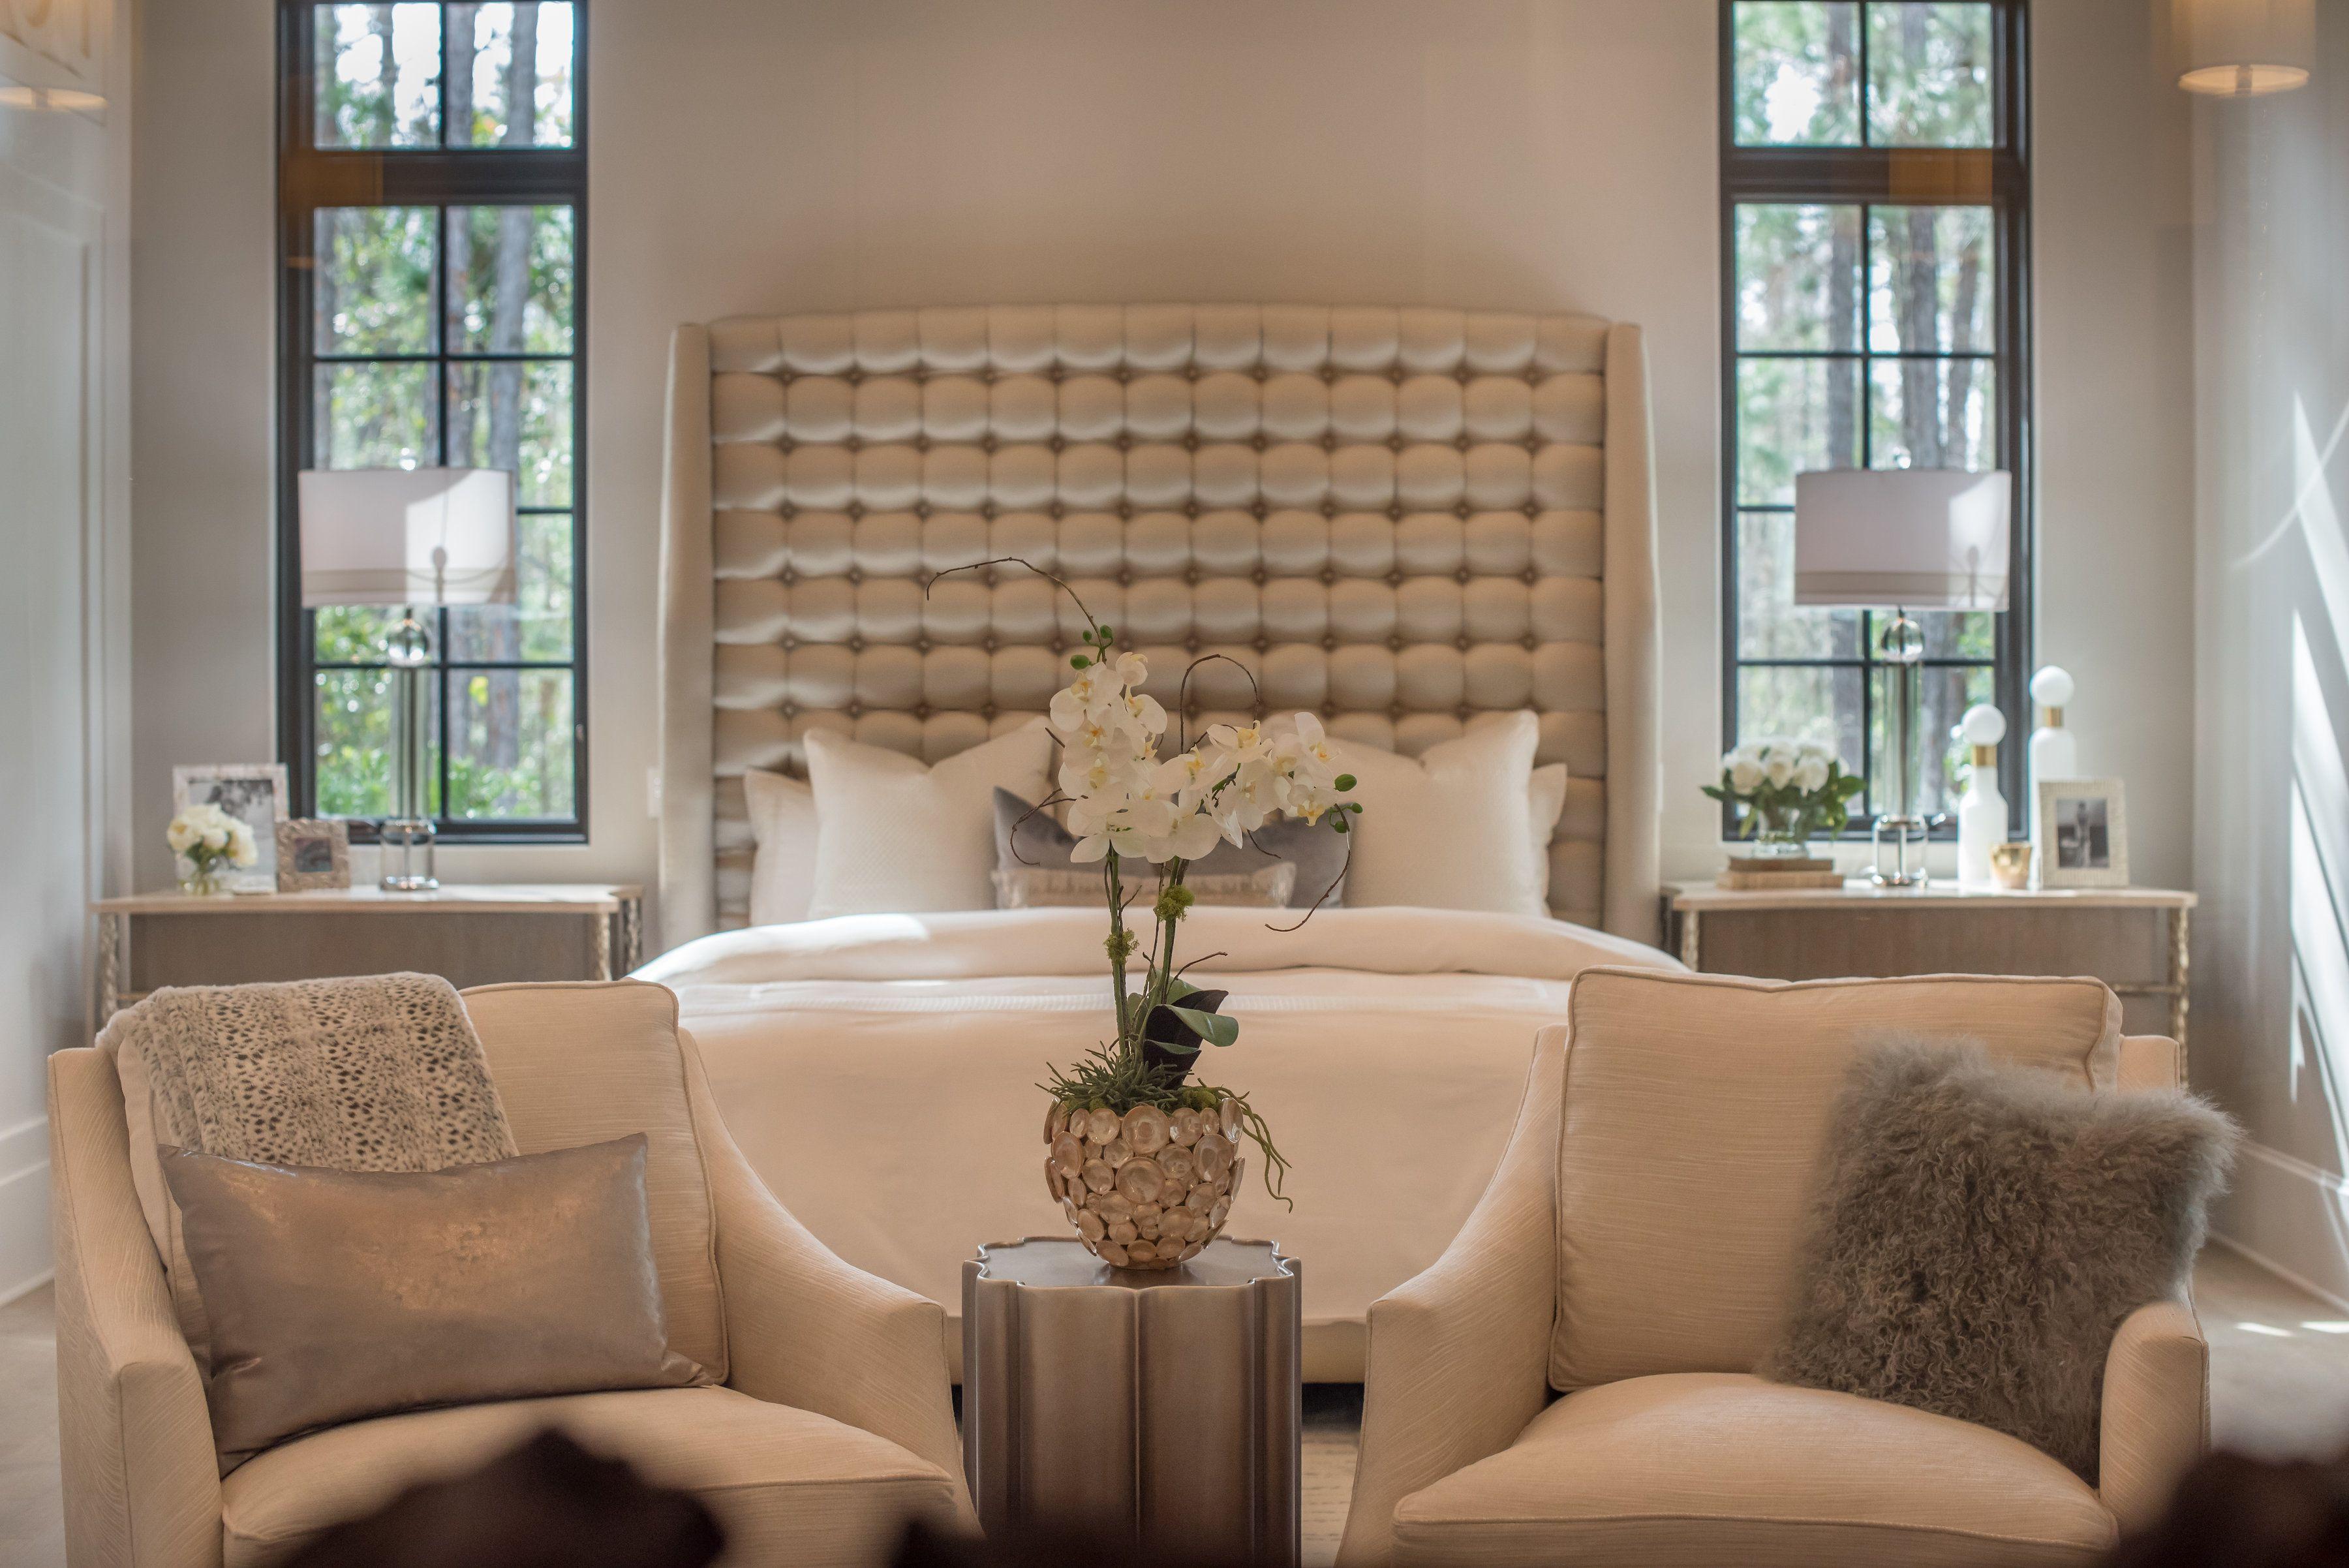 Camera Da Letto Padronale The Sims : Toni sims design studio luxury modern and contemporary bedroom